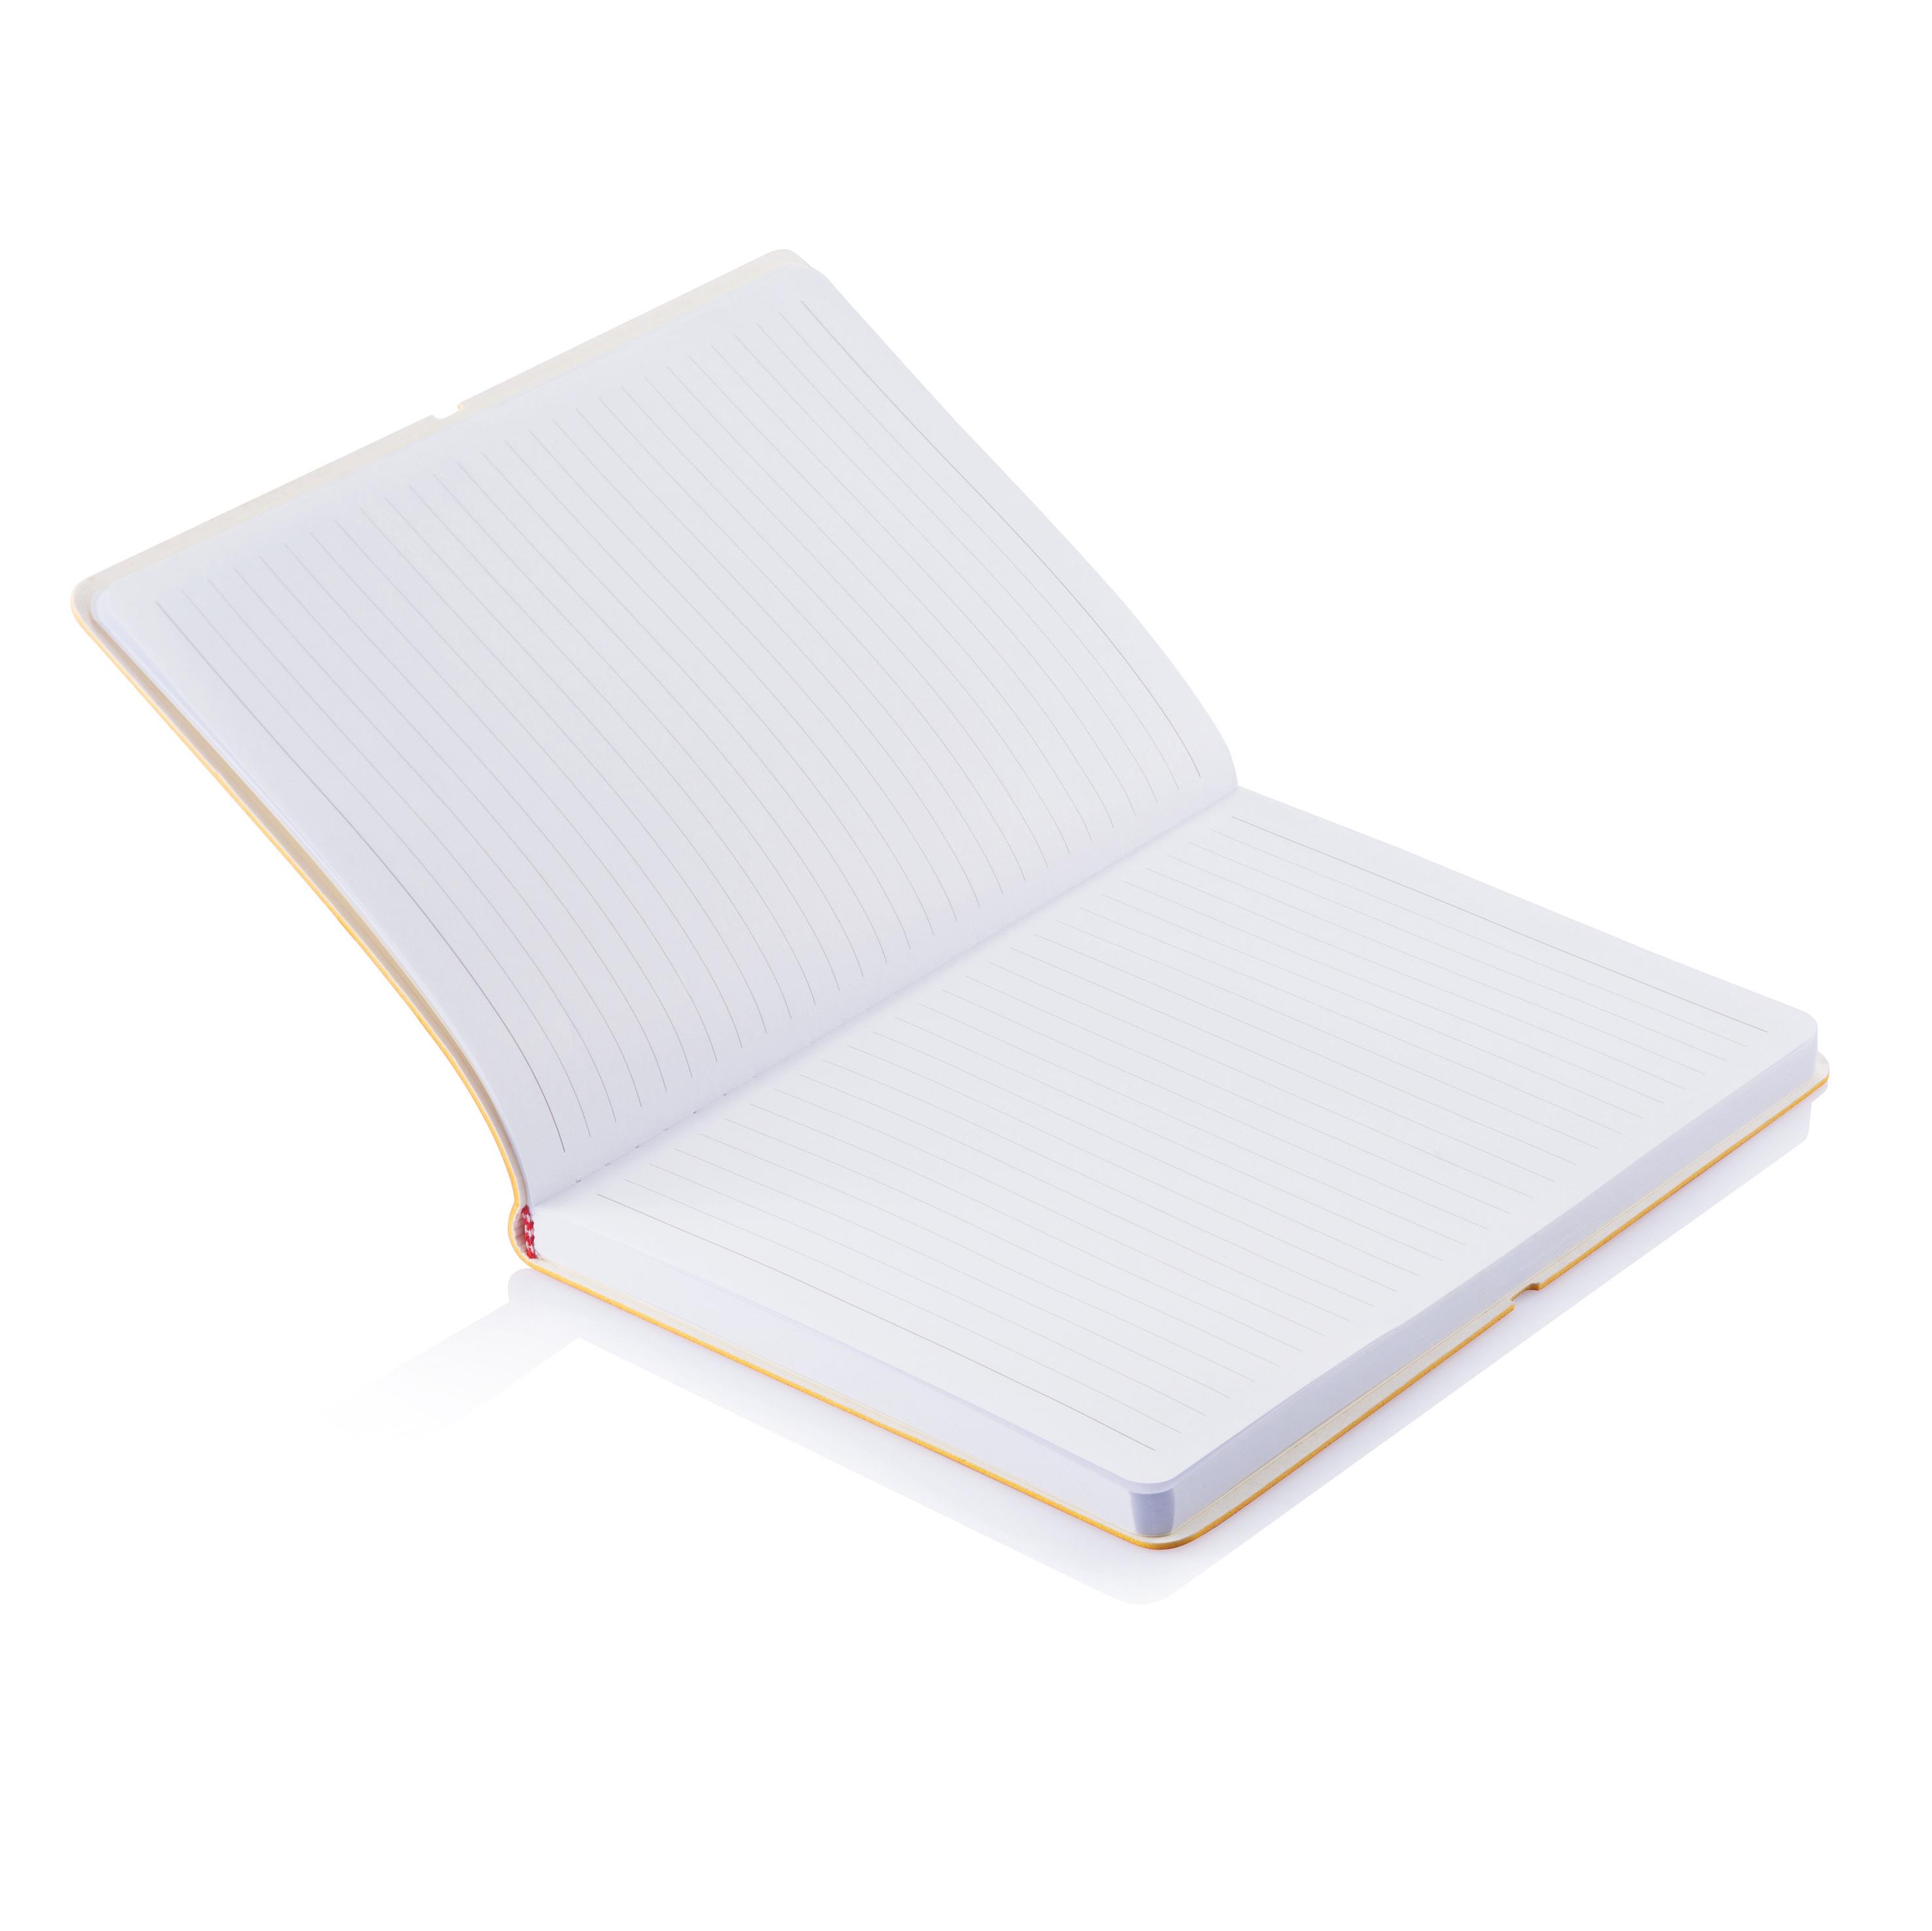 Carnet de notes A5